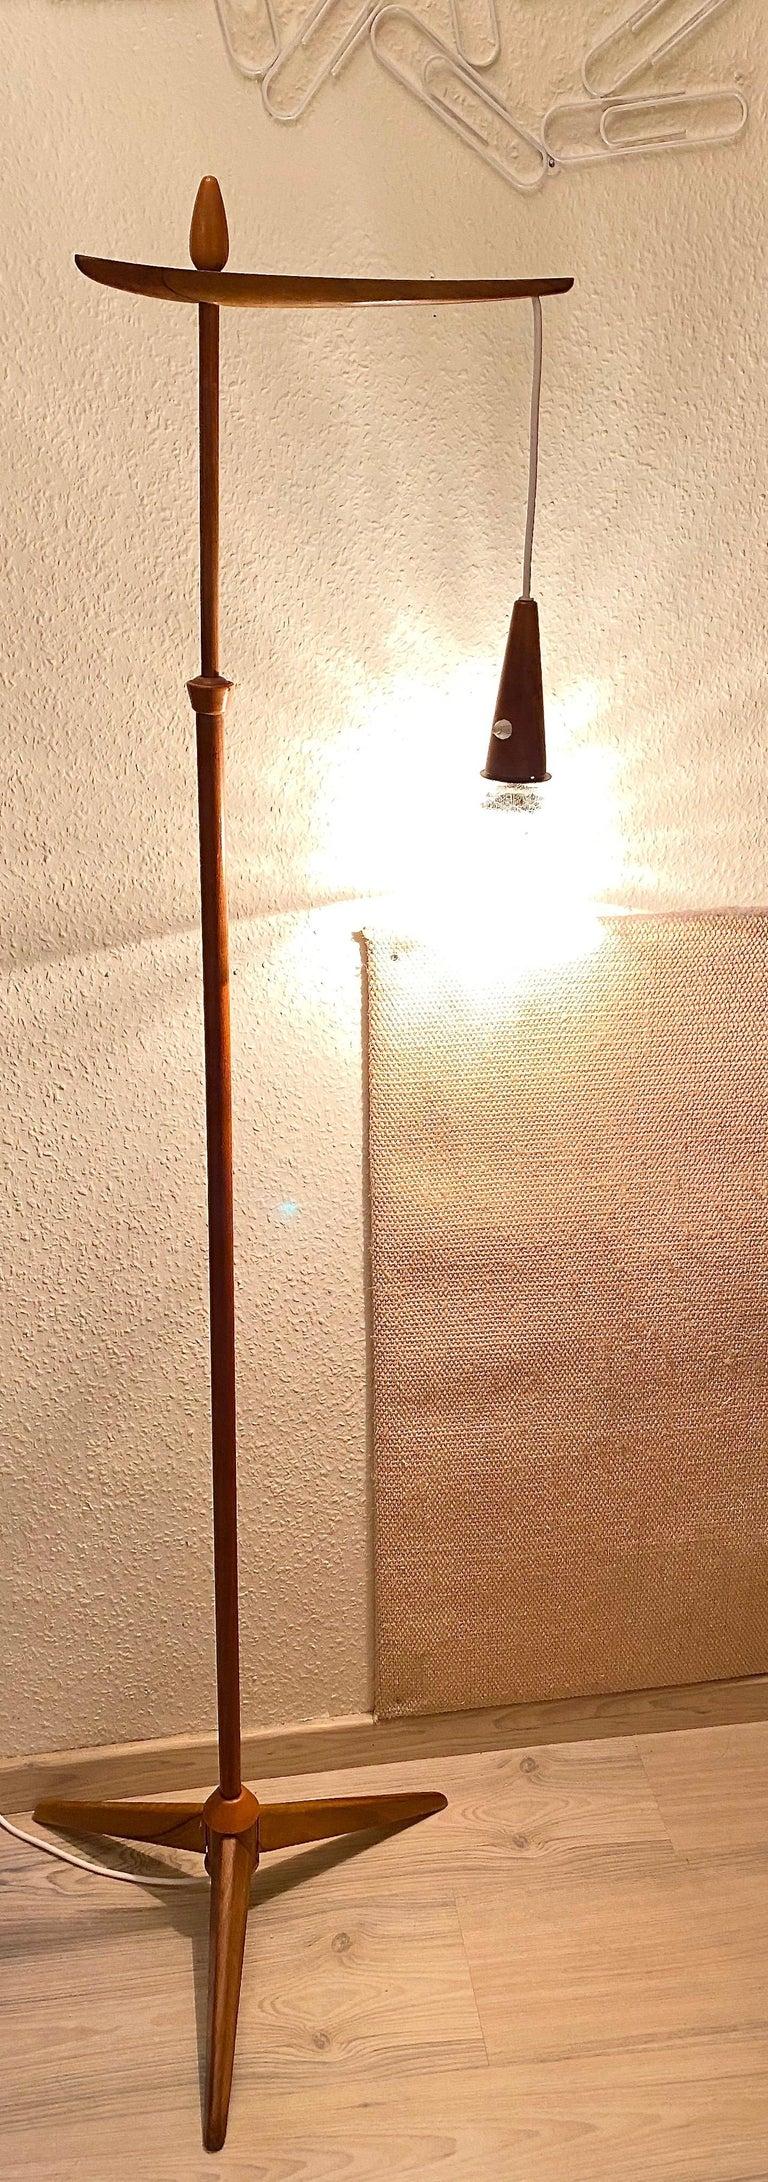 1960s Danish Mid-Century Modern Wood Tripod Leg Floor Lamp with Glass Shade For Sale 6